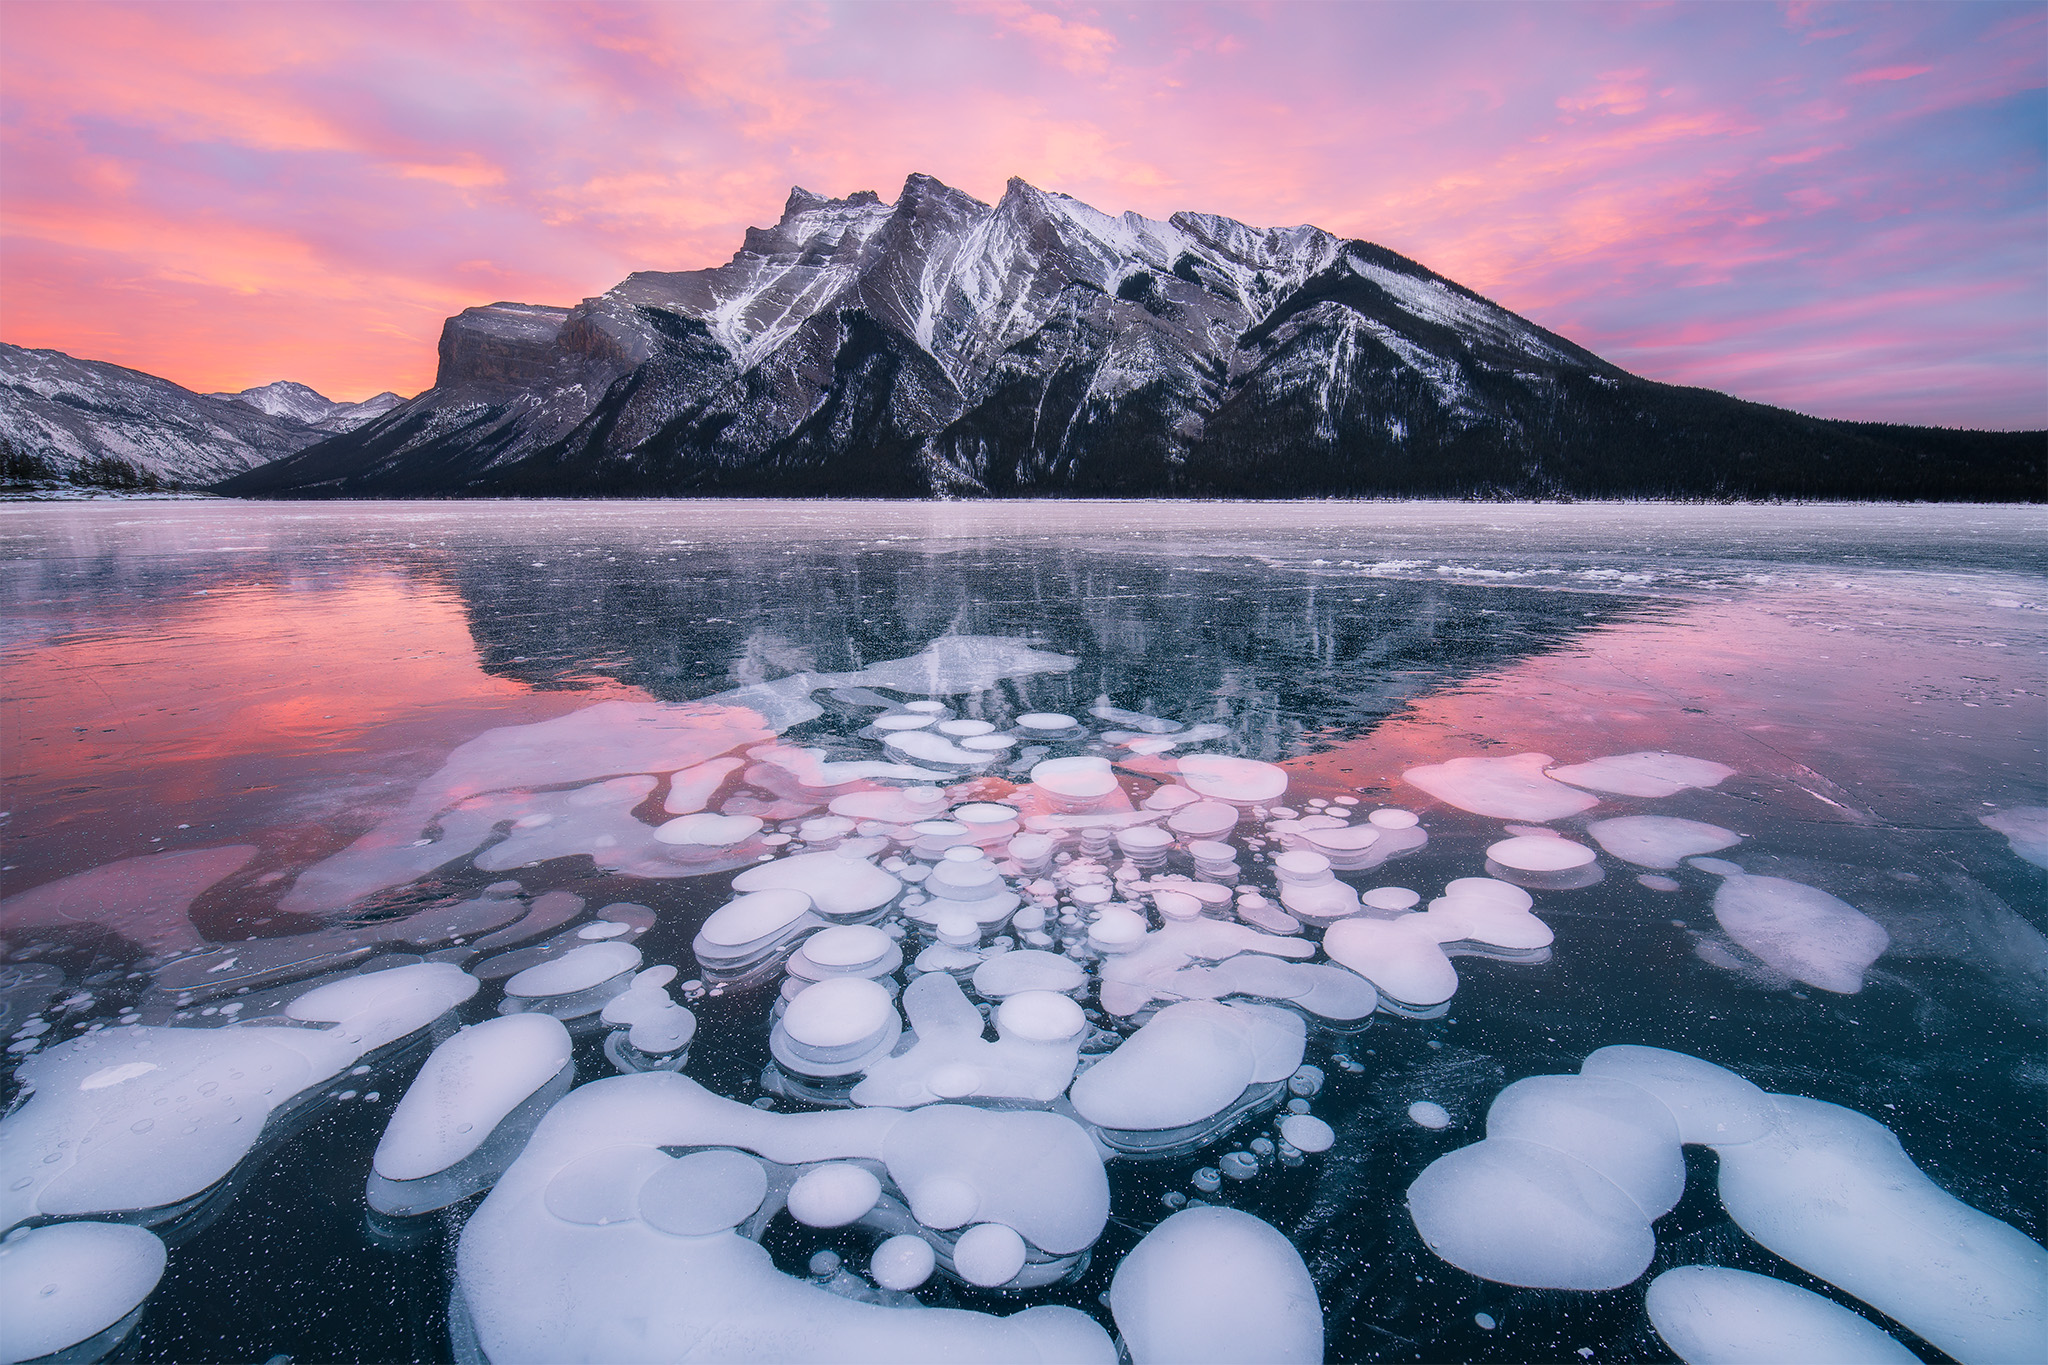 Sunrise photograph of Lake Minnewanka during winter with frozen bubbles